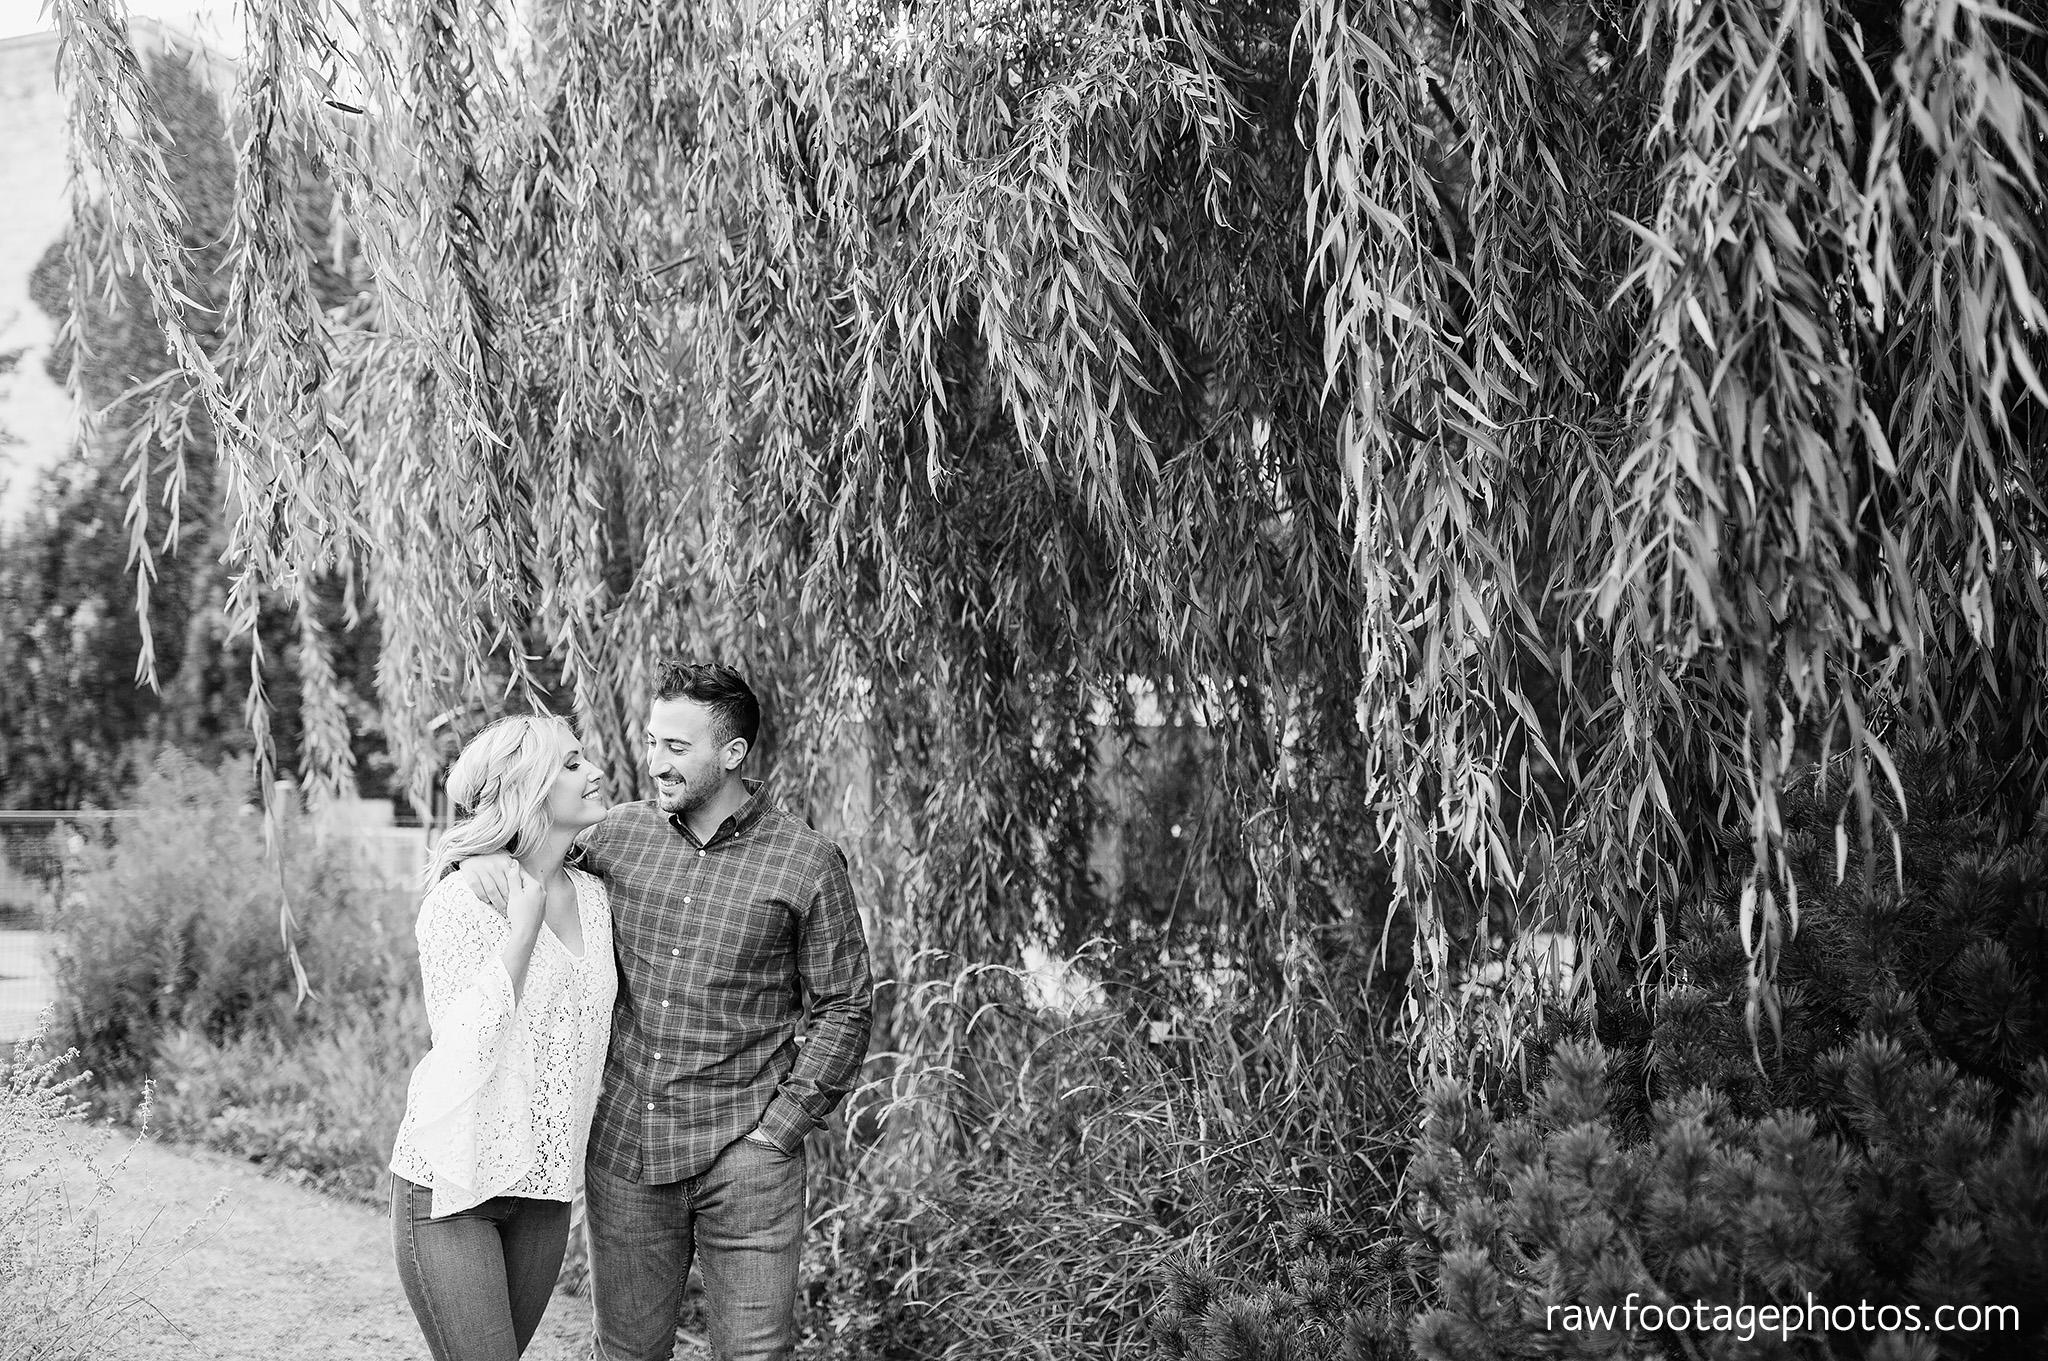 london_ontario_wedding_photographer-raw_footage_photography-engagement_session-uwo-campus-gibbons_park-woods008.jpg